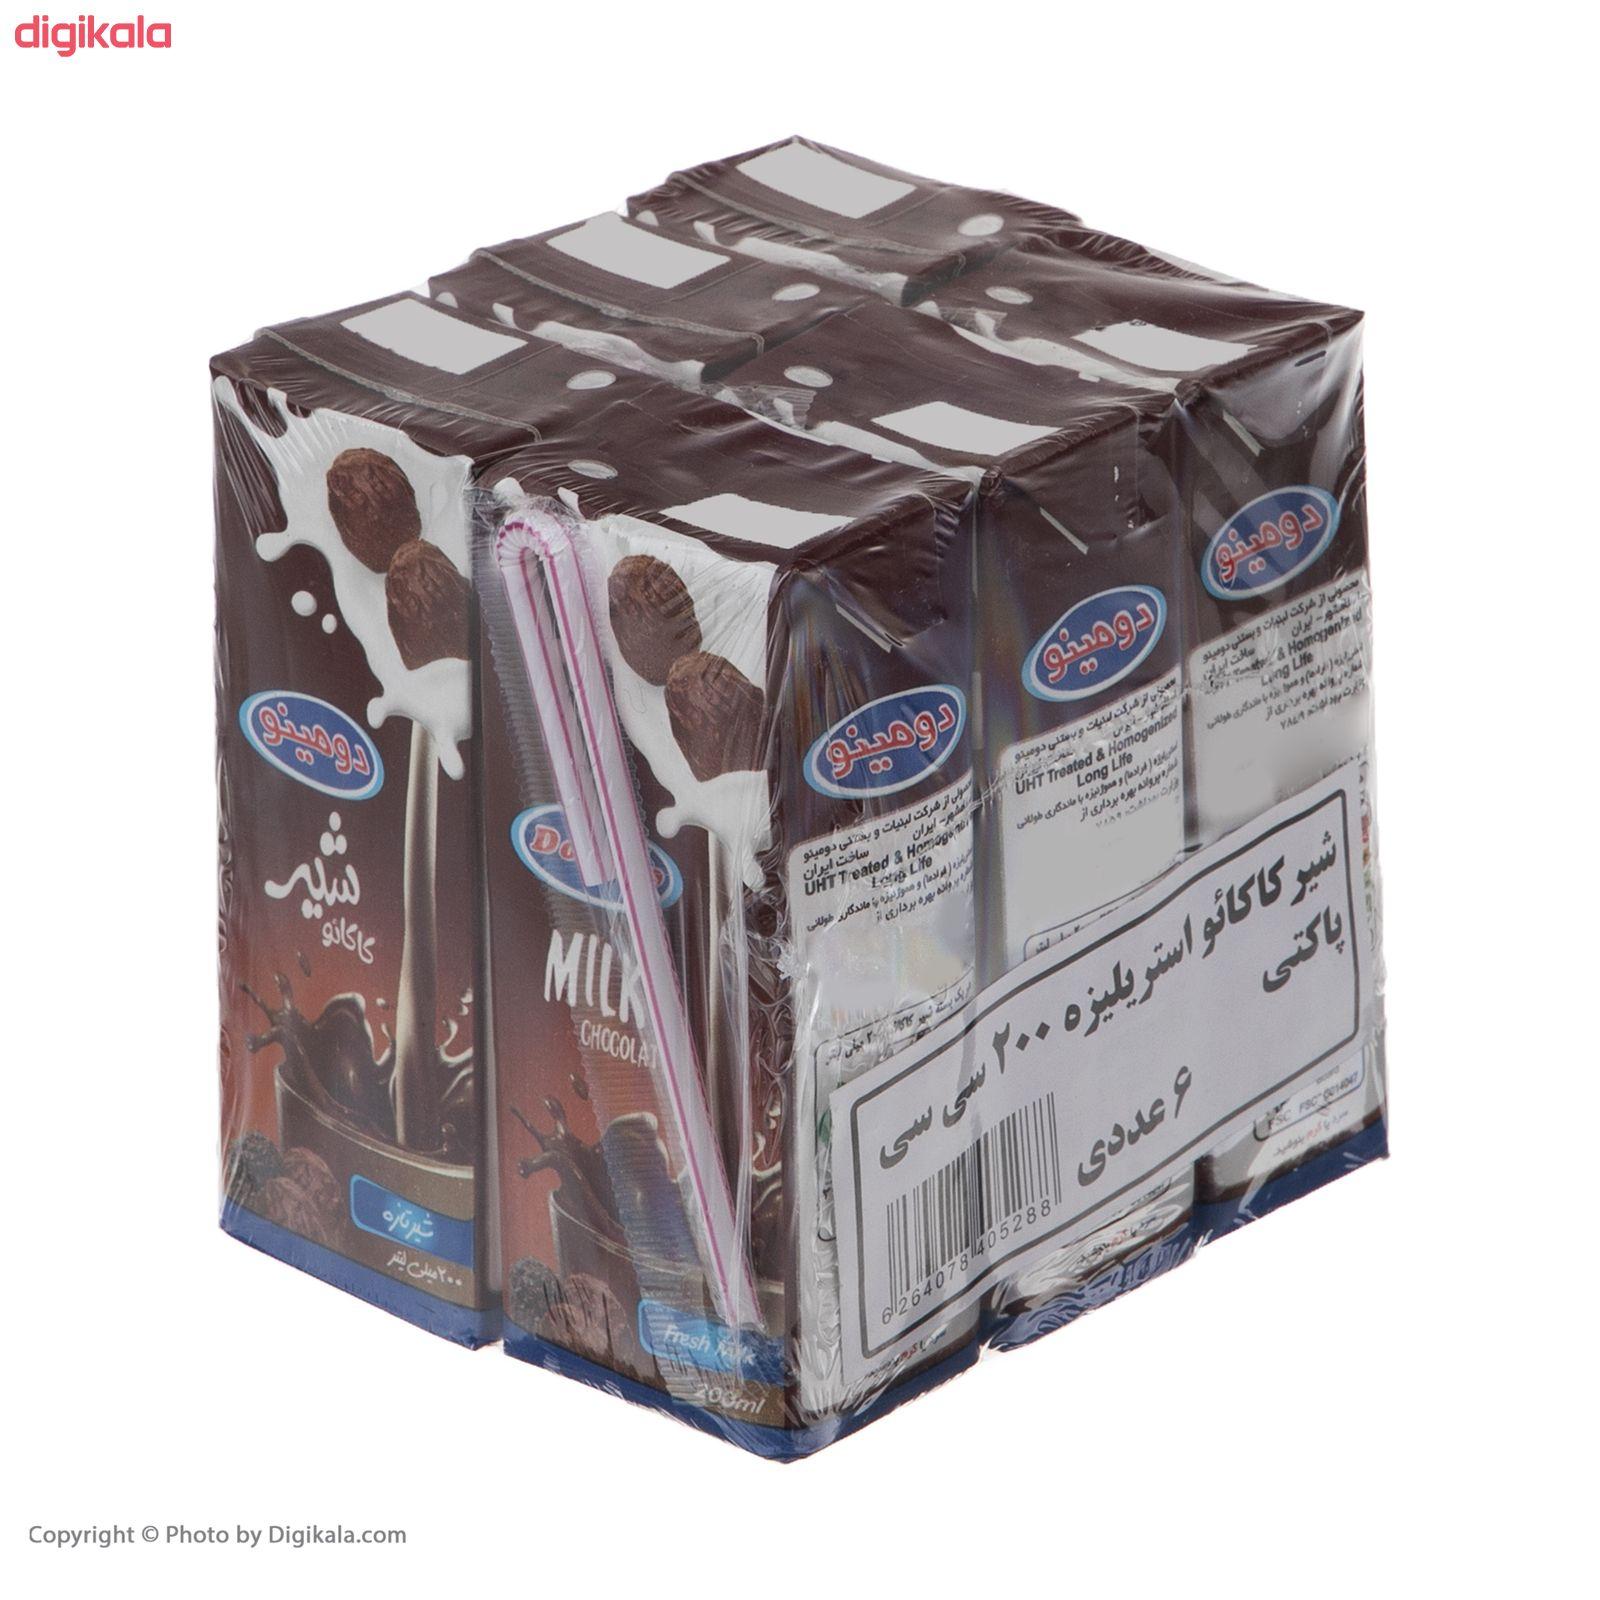 شیر کاکائو دومینو - 0.2 لیتر بسته 6 عددی main 1 4